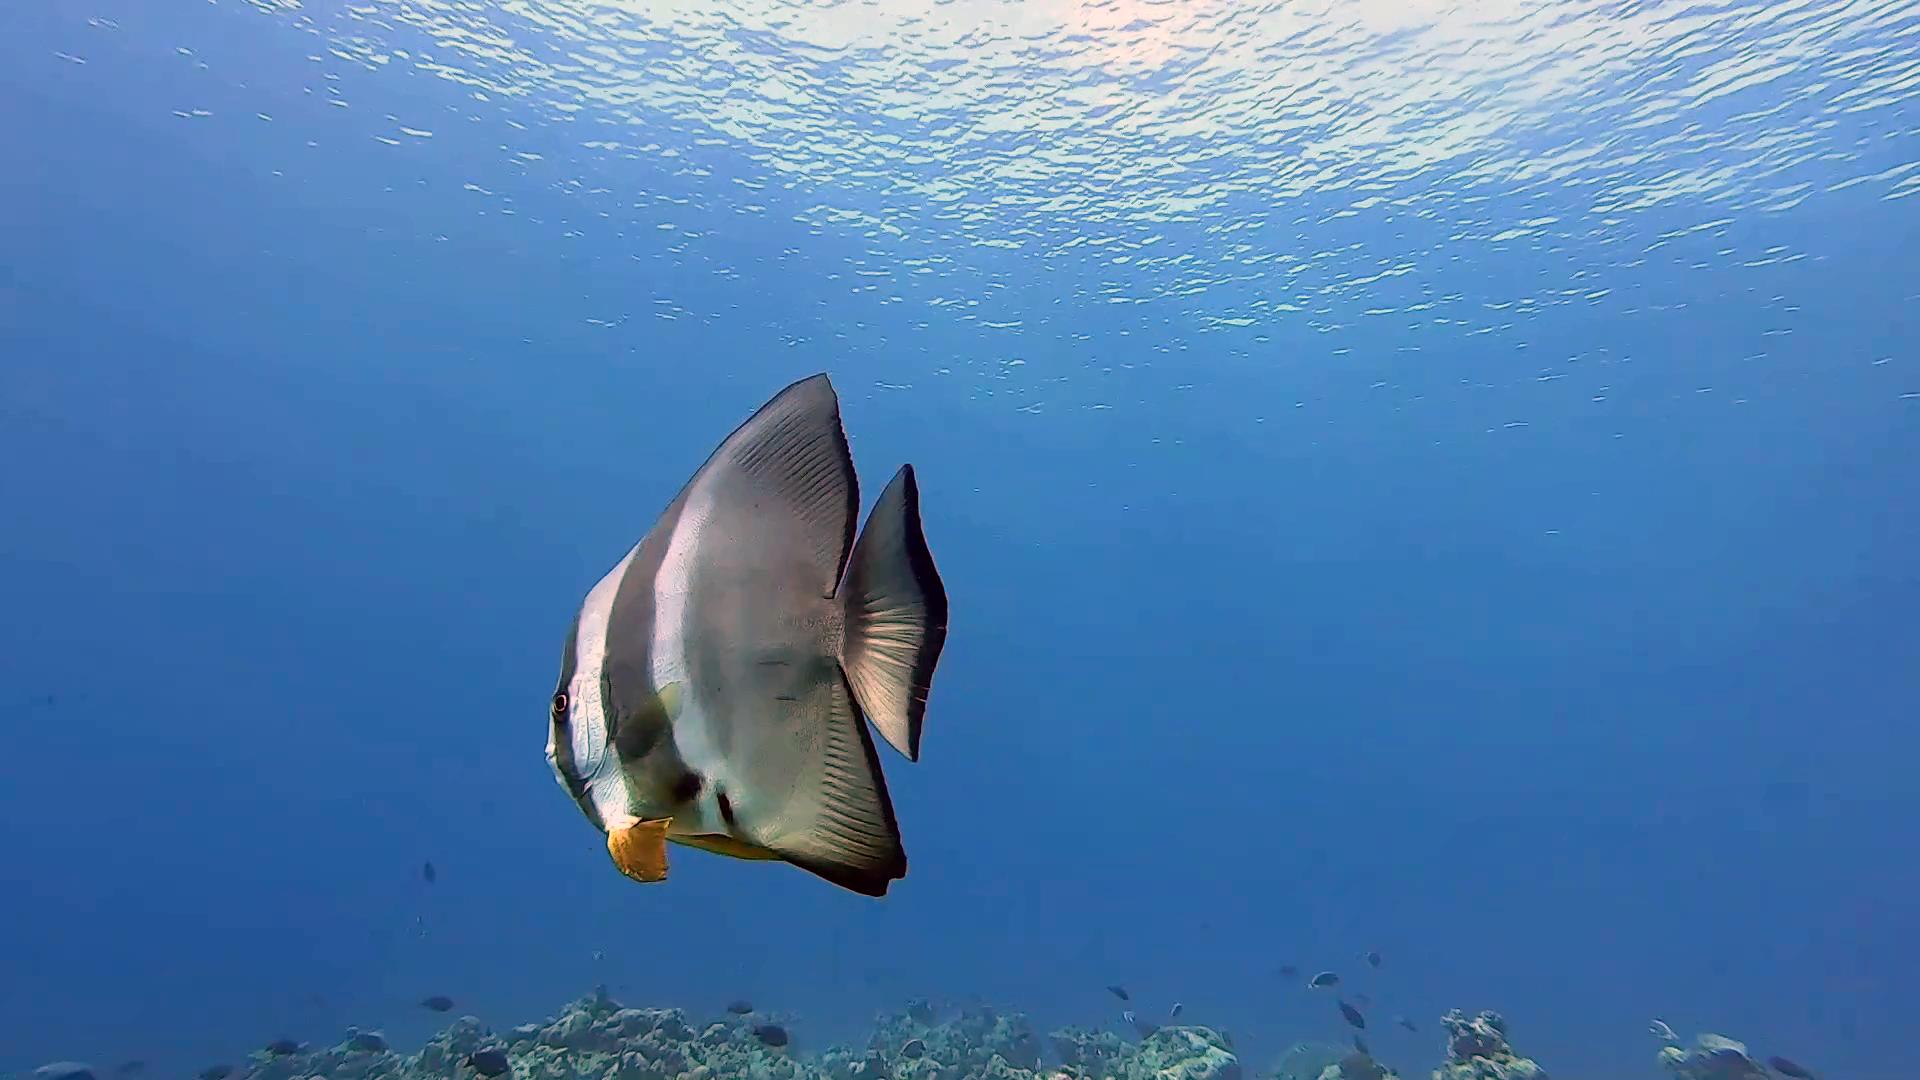 pesce Pipistrello - orbicular Batfish - Platax orbicularis - intotheblue.it